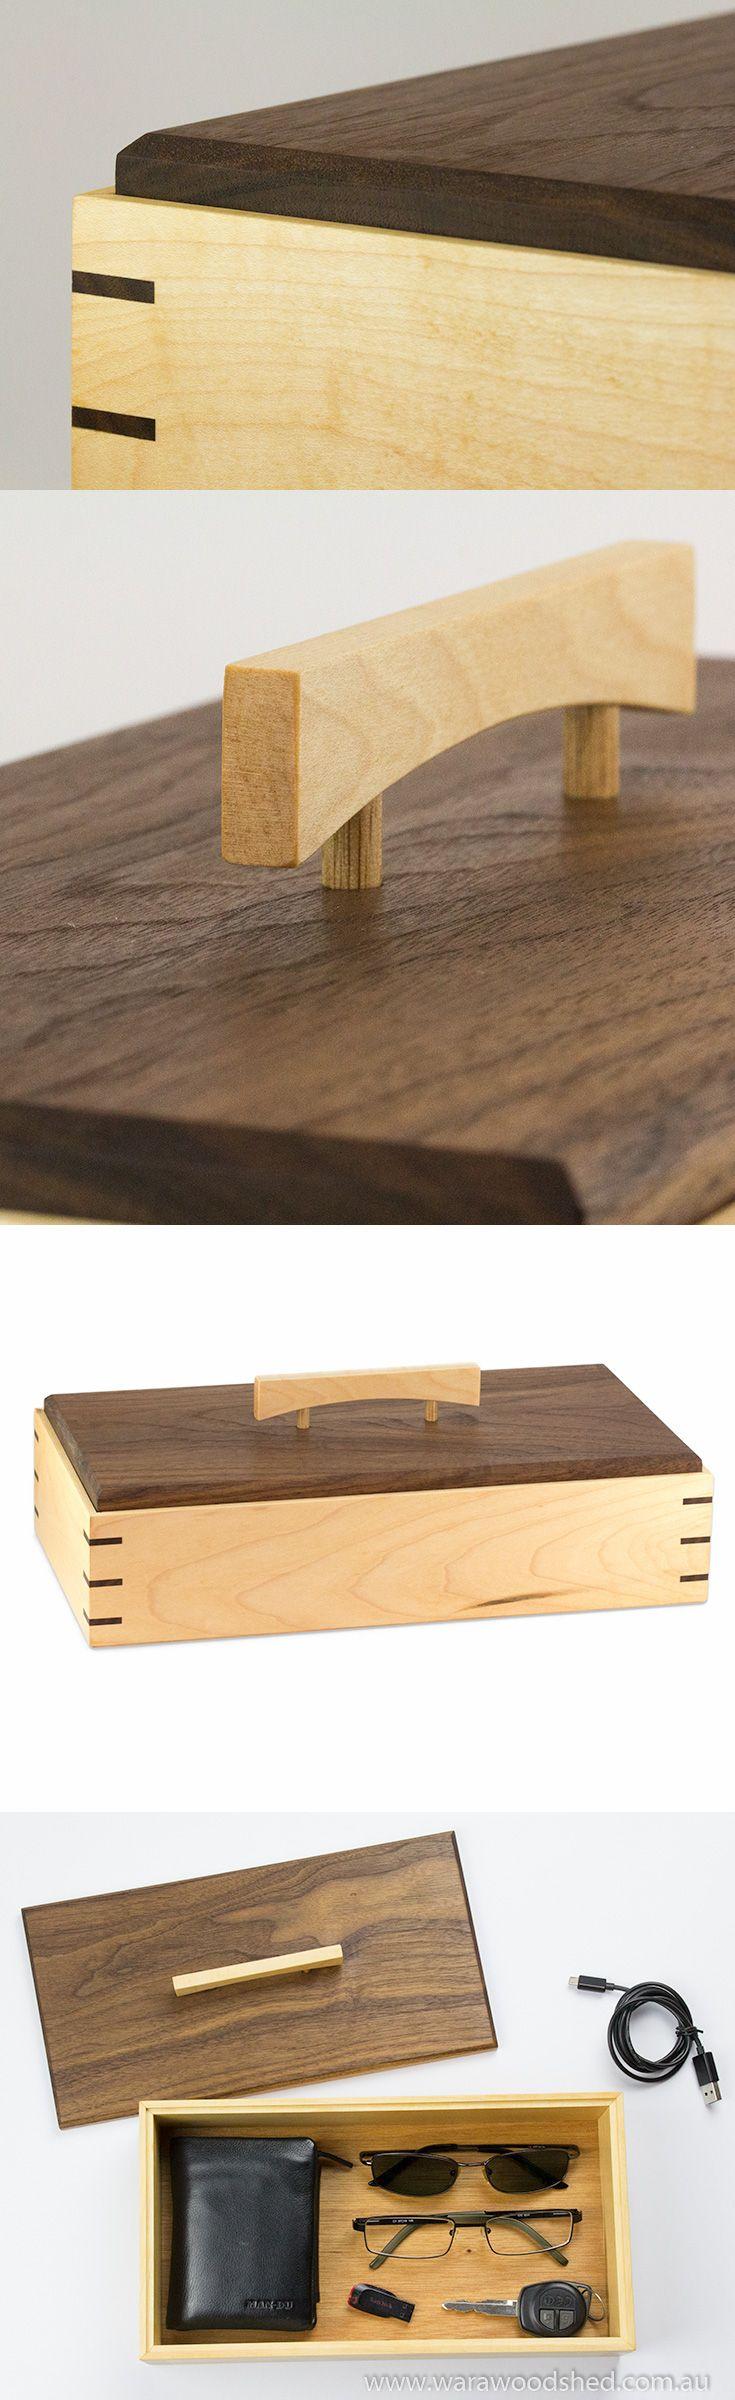 An elegant wooden keepsake box made from Rock Maple and Black Walnut.